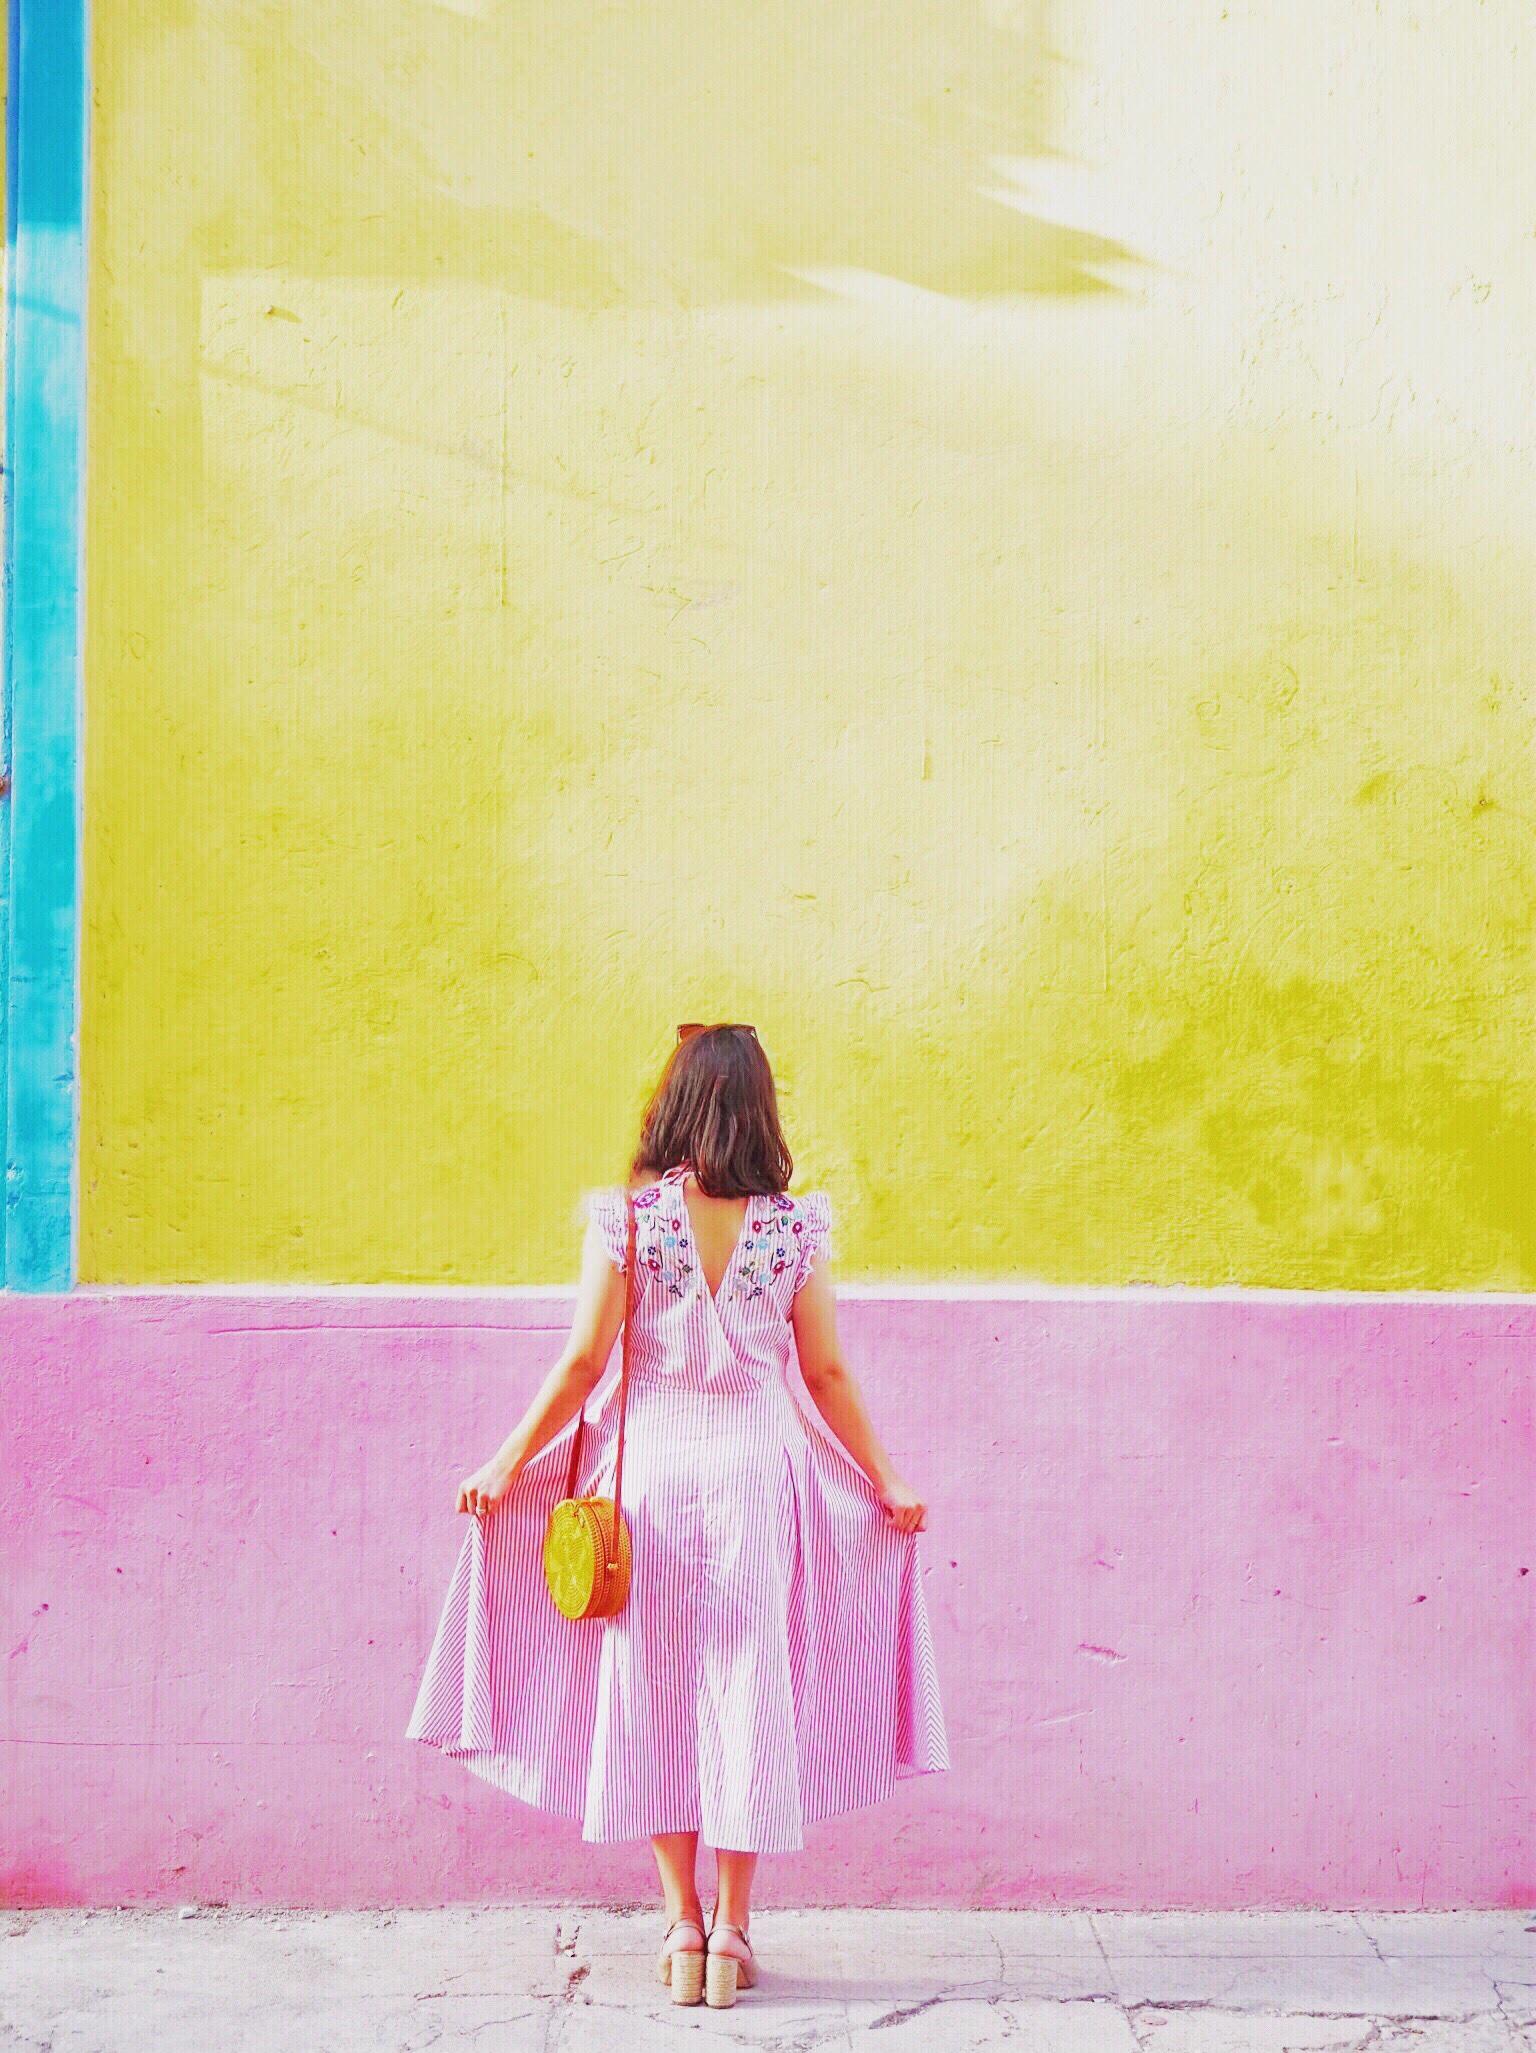 img 8423 - Old Habana - 街全体が世界遺産 色が溢れるハバナ旧市街散歩で出会った風景